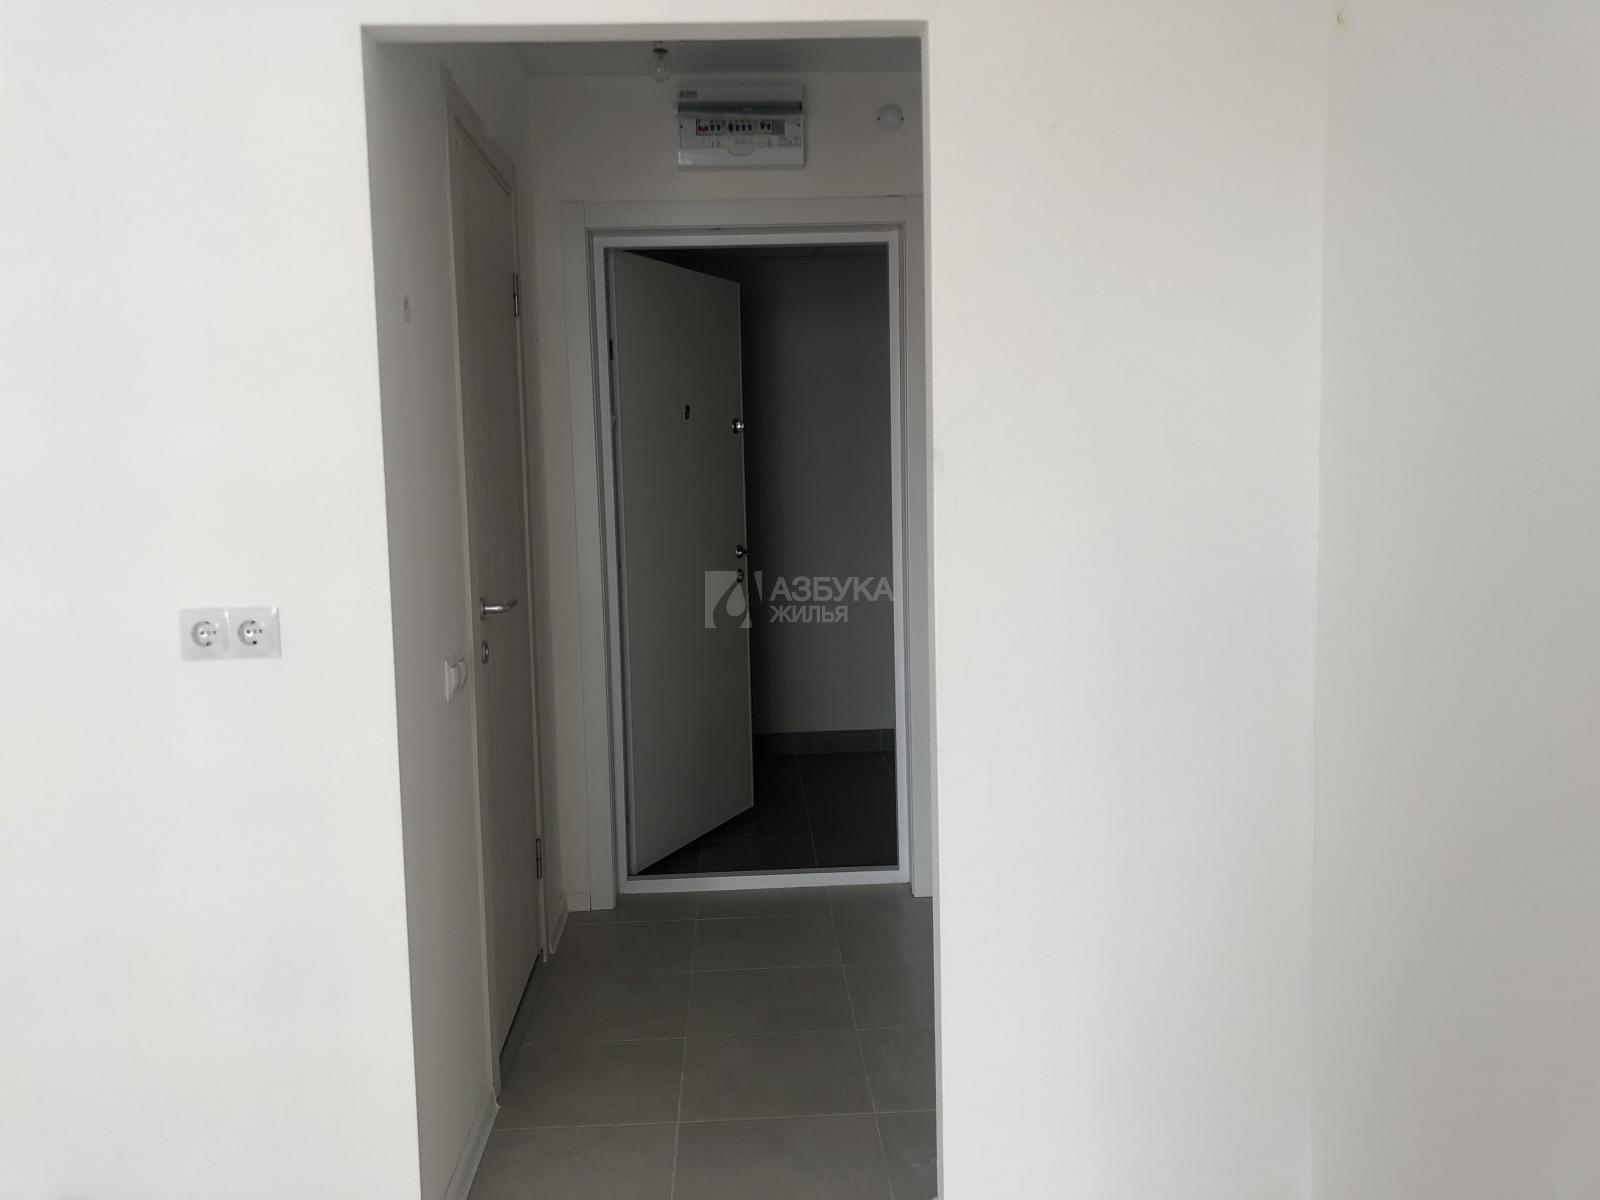 Фото №5 - 1-комнатная квартира, Люберцы, лётчика Ларюшина улица 12, метро Котельники